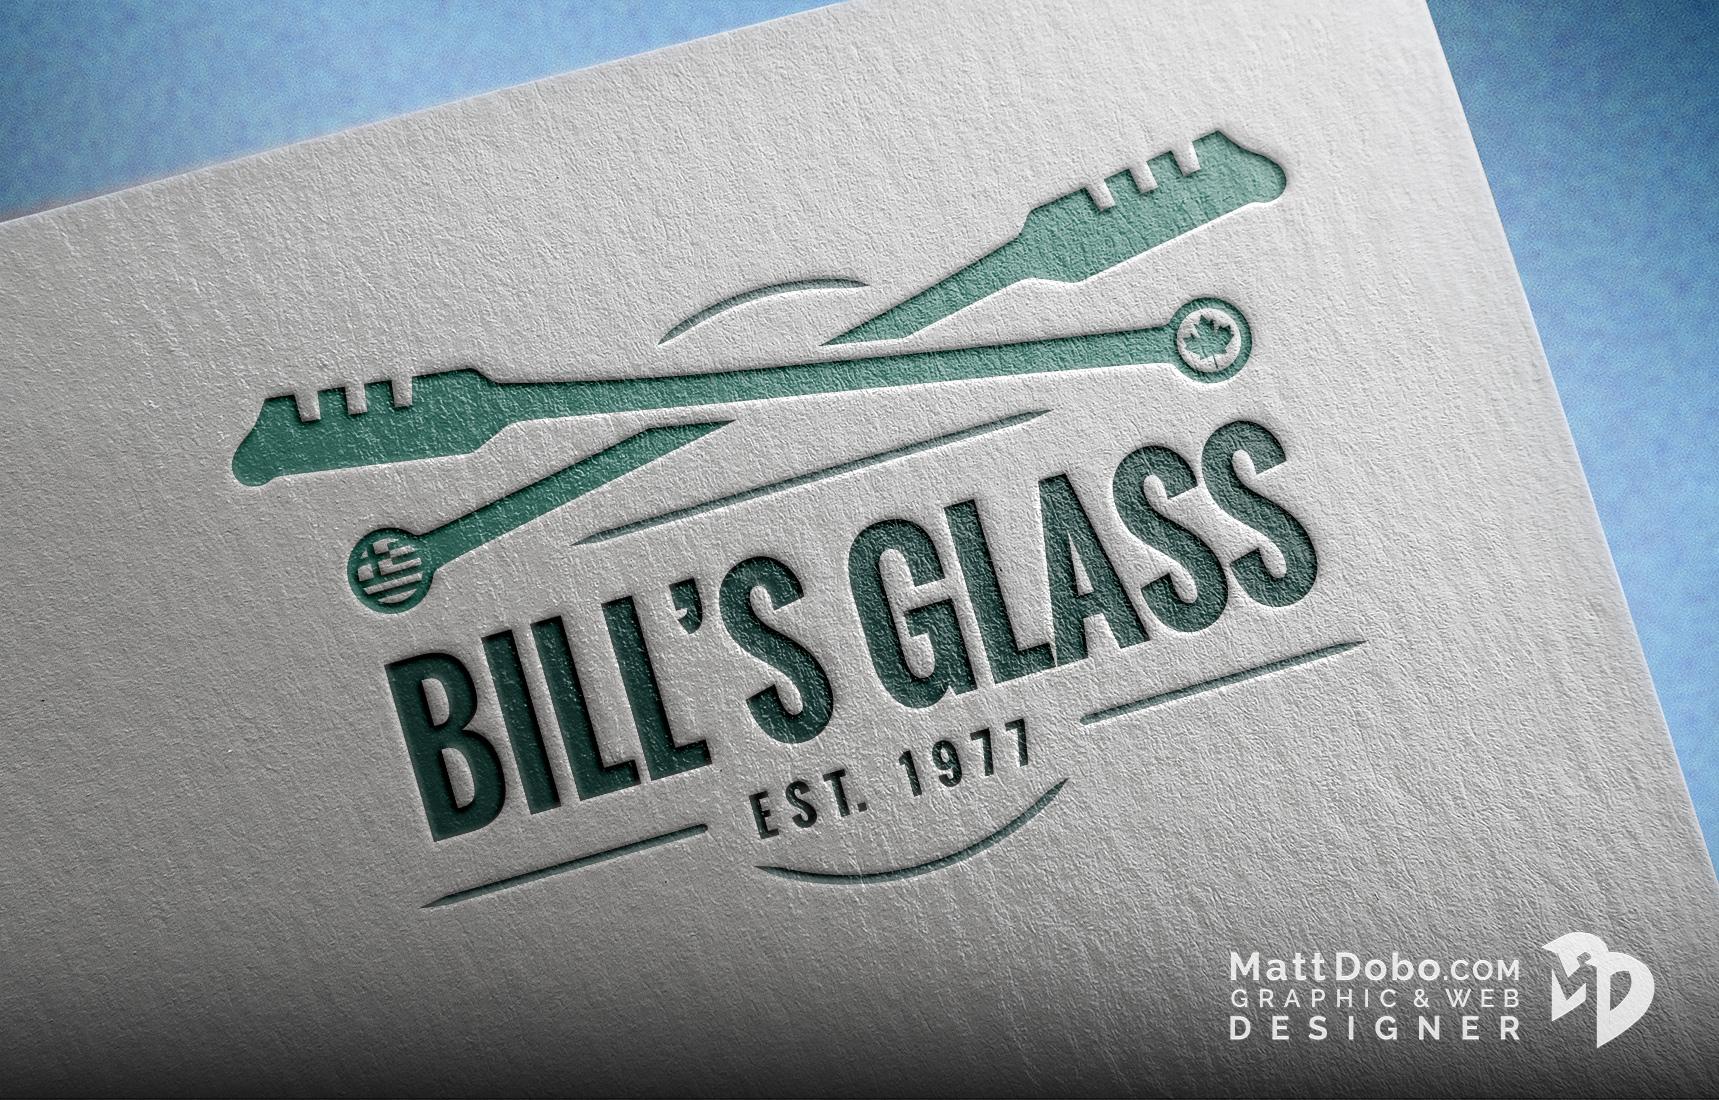 Bill's Glass Corporate Logo